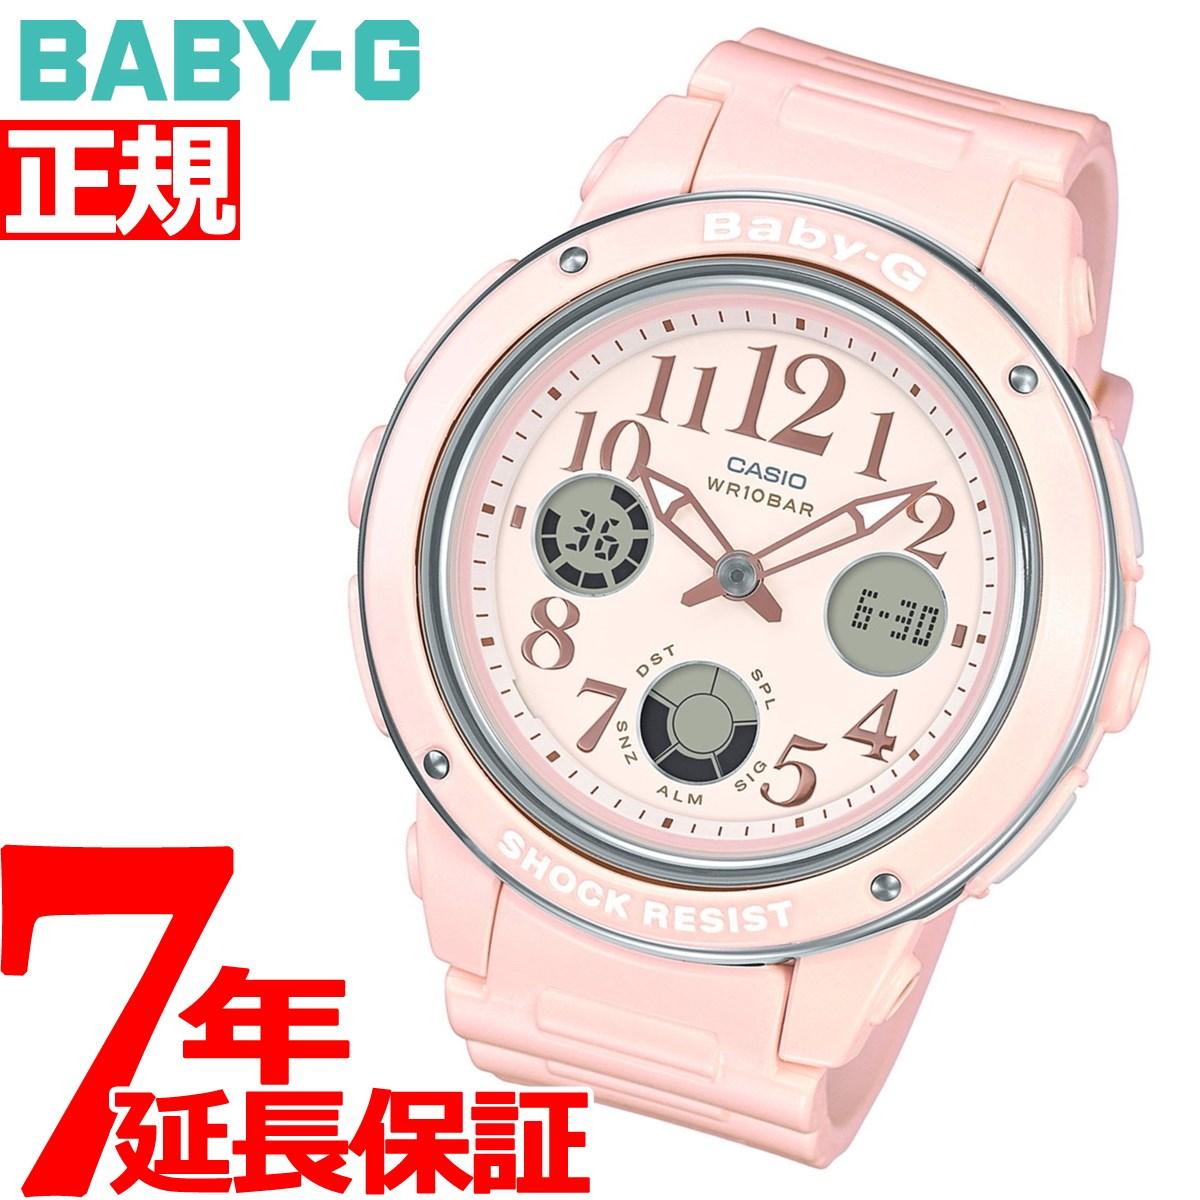 CASIO BABY-G カシオ ベビーG 腕時計 レディース パステル・ピンク アナデジ BGA-150EF-4BJF